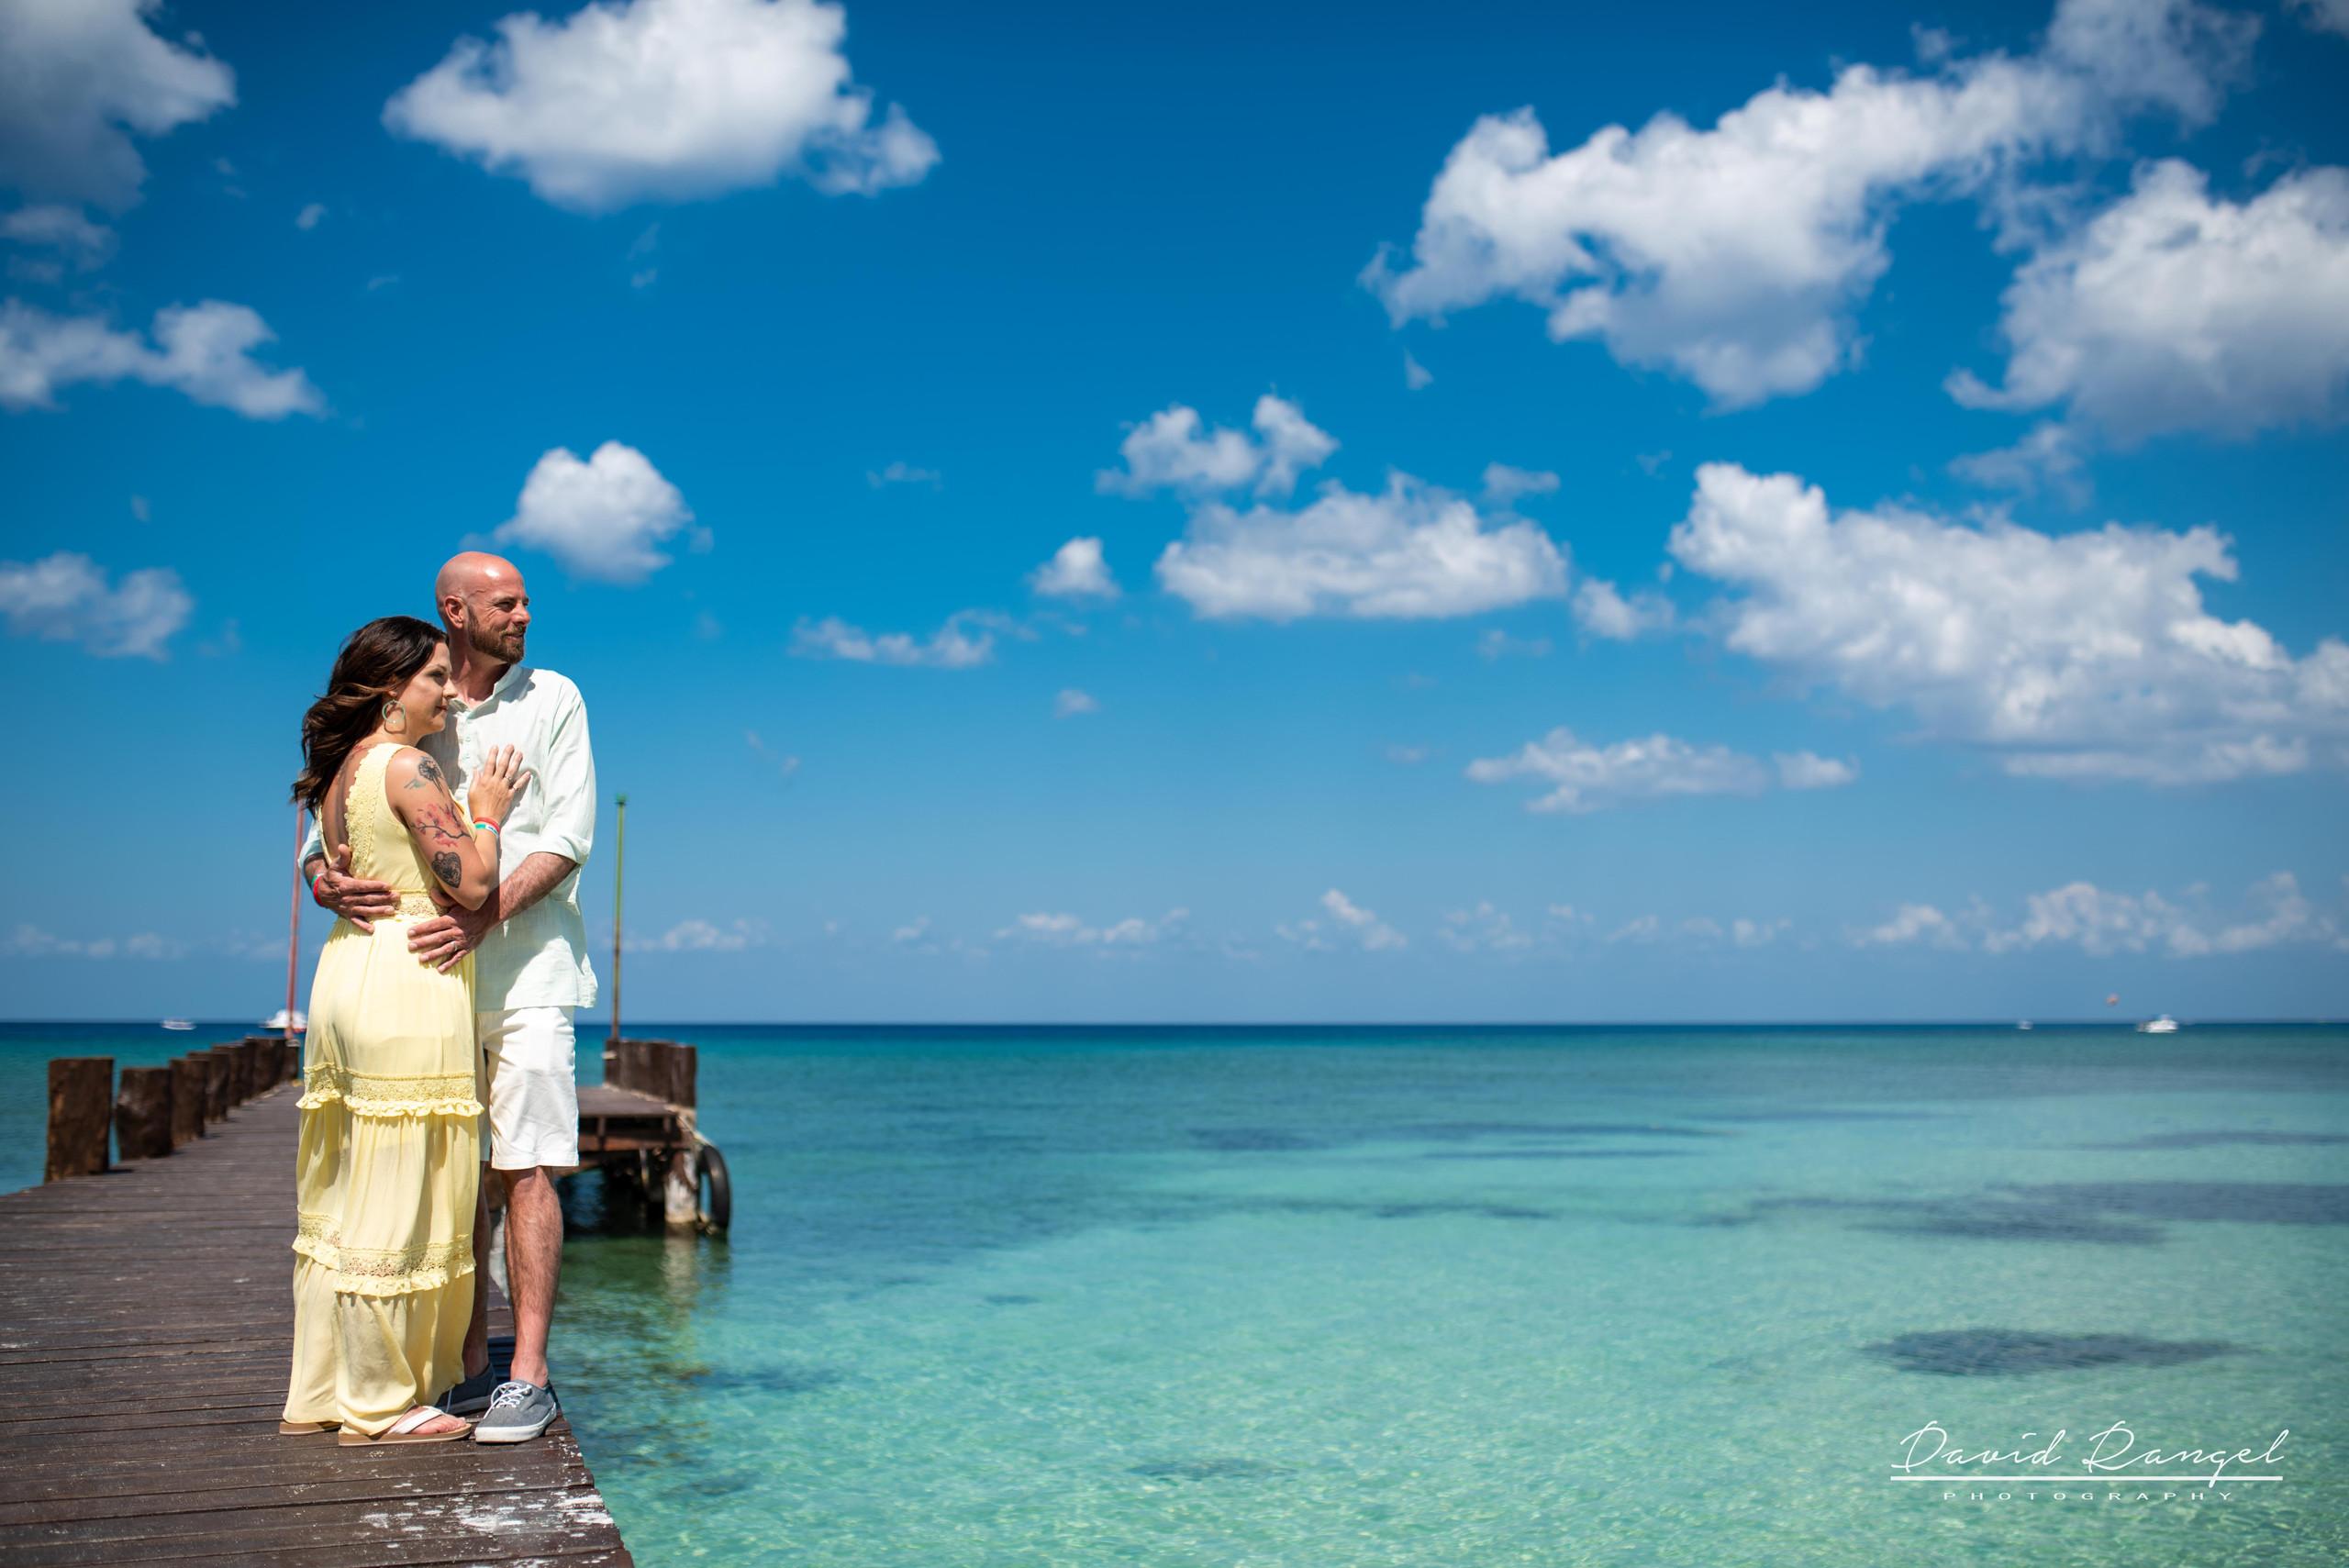 session+beach+cozumel+island+photo+destination+photographer+couple+water+pier